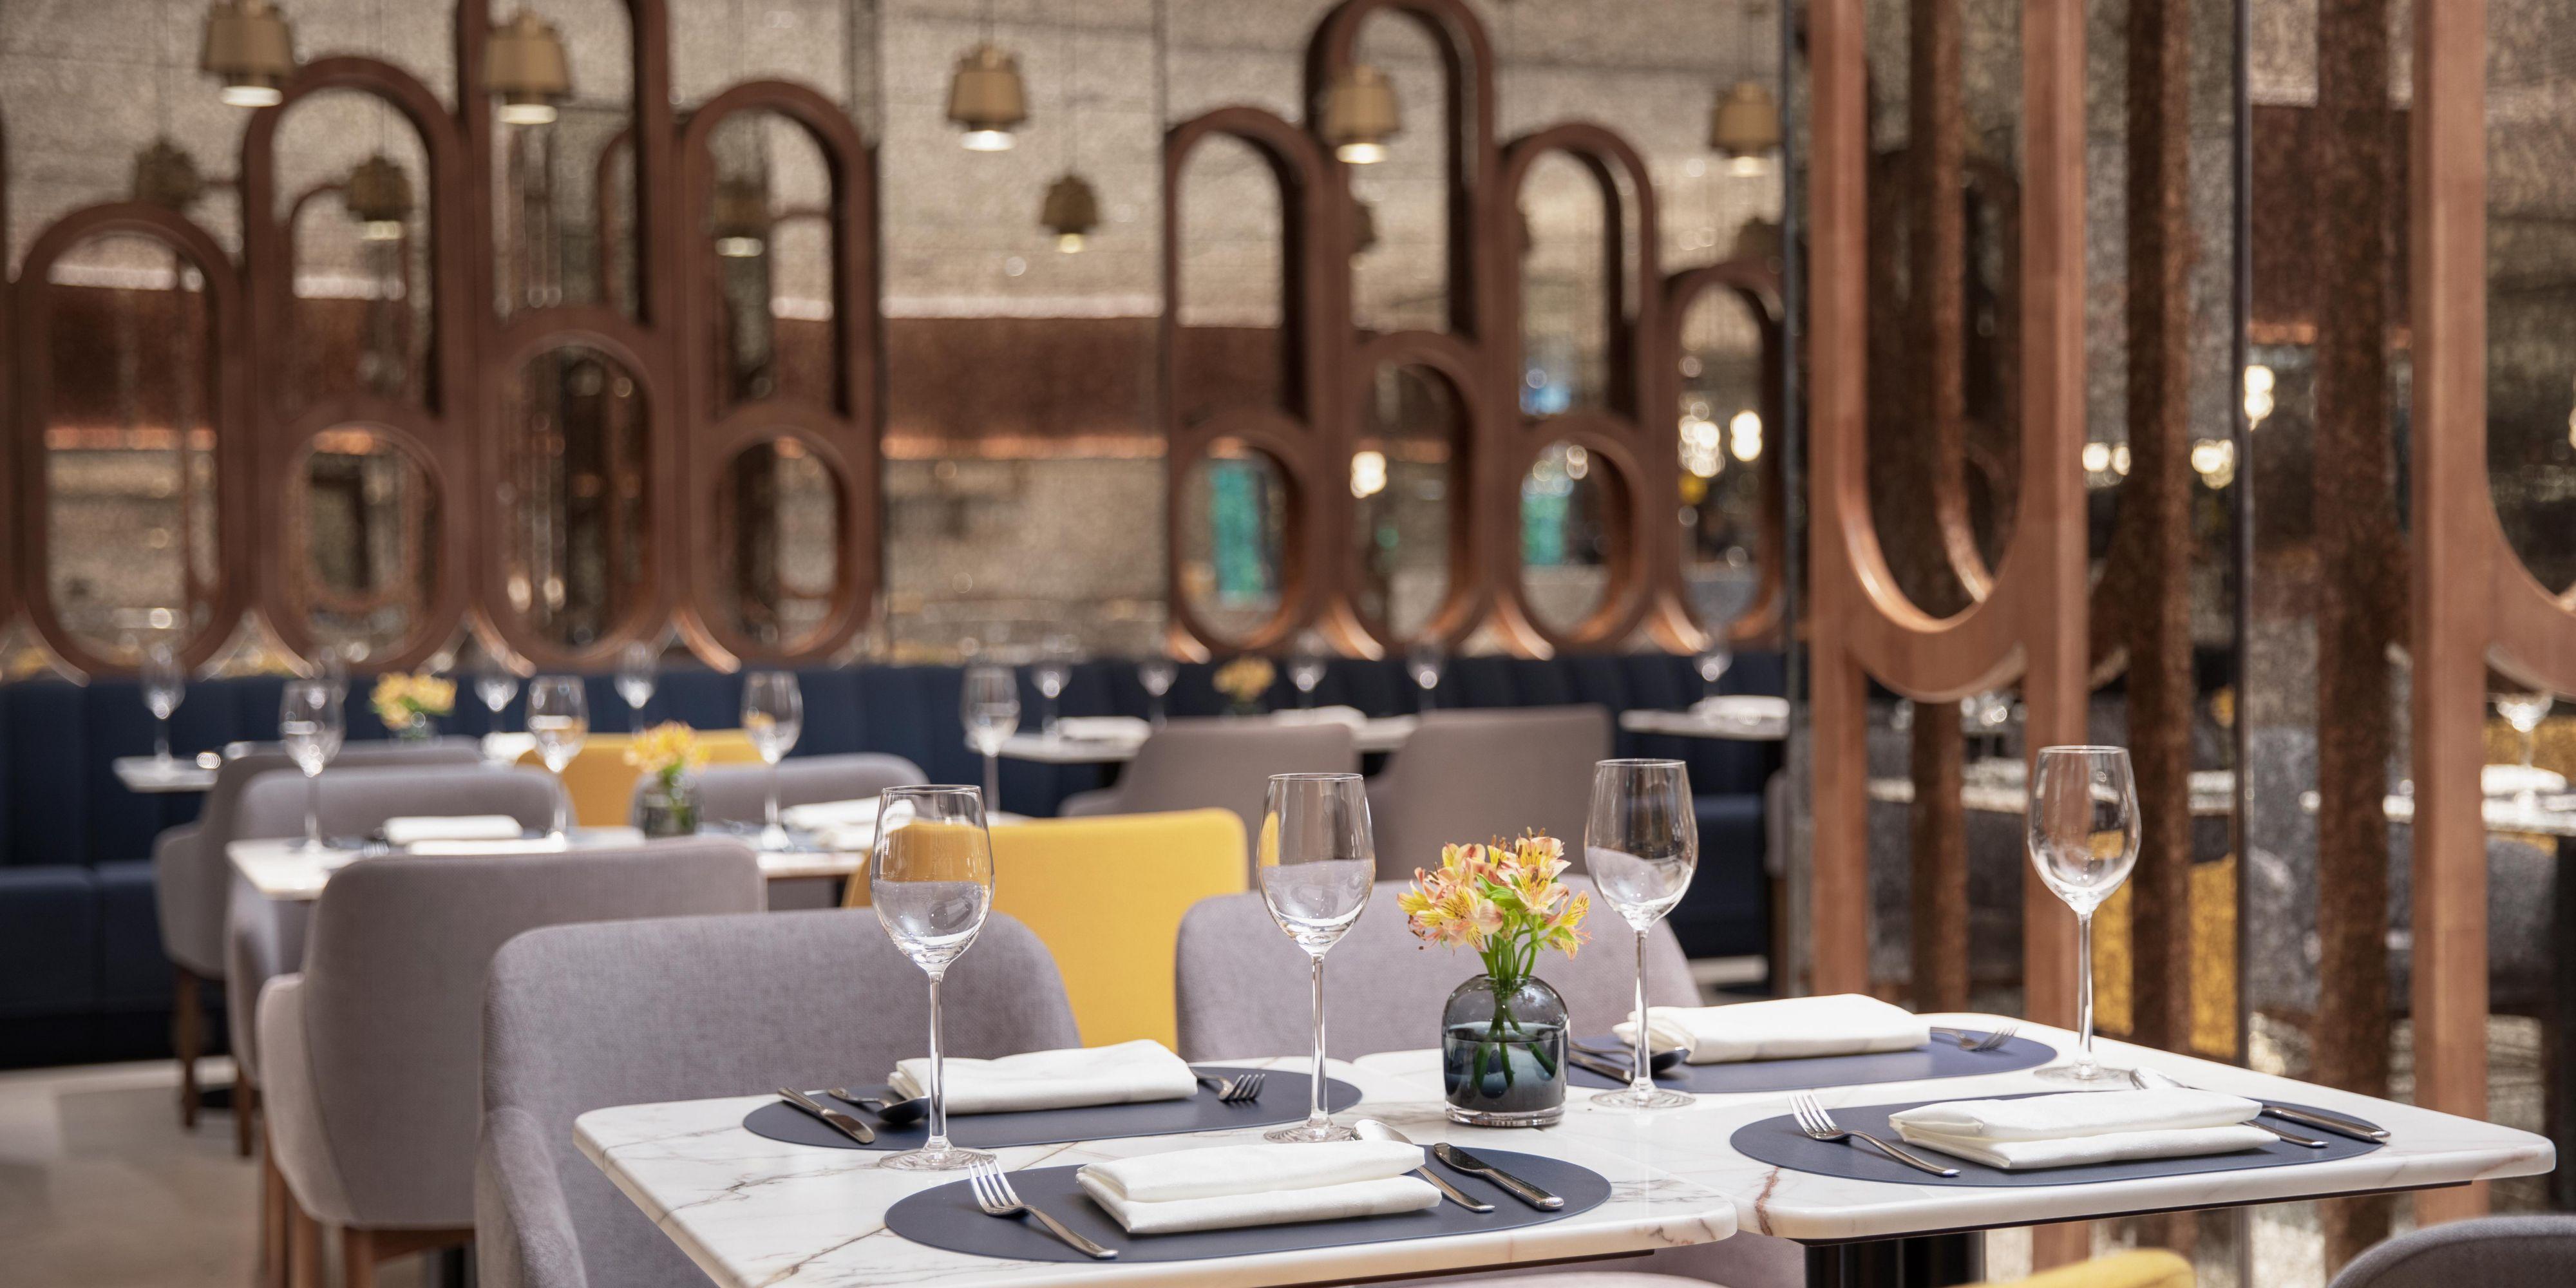 All-day Dining Restaurant